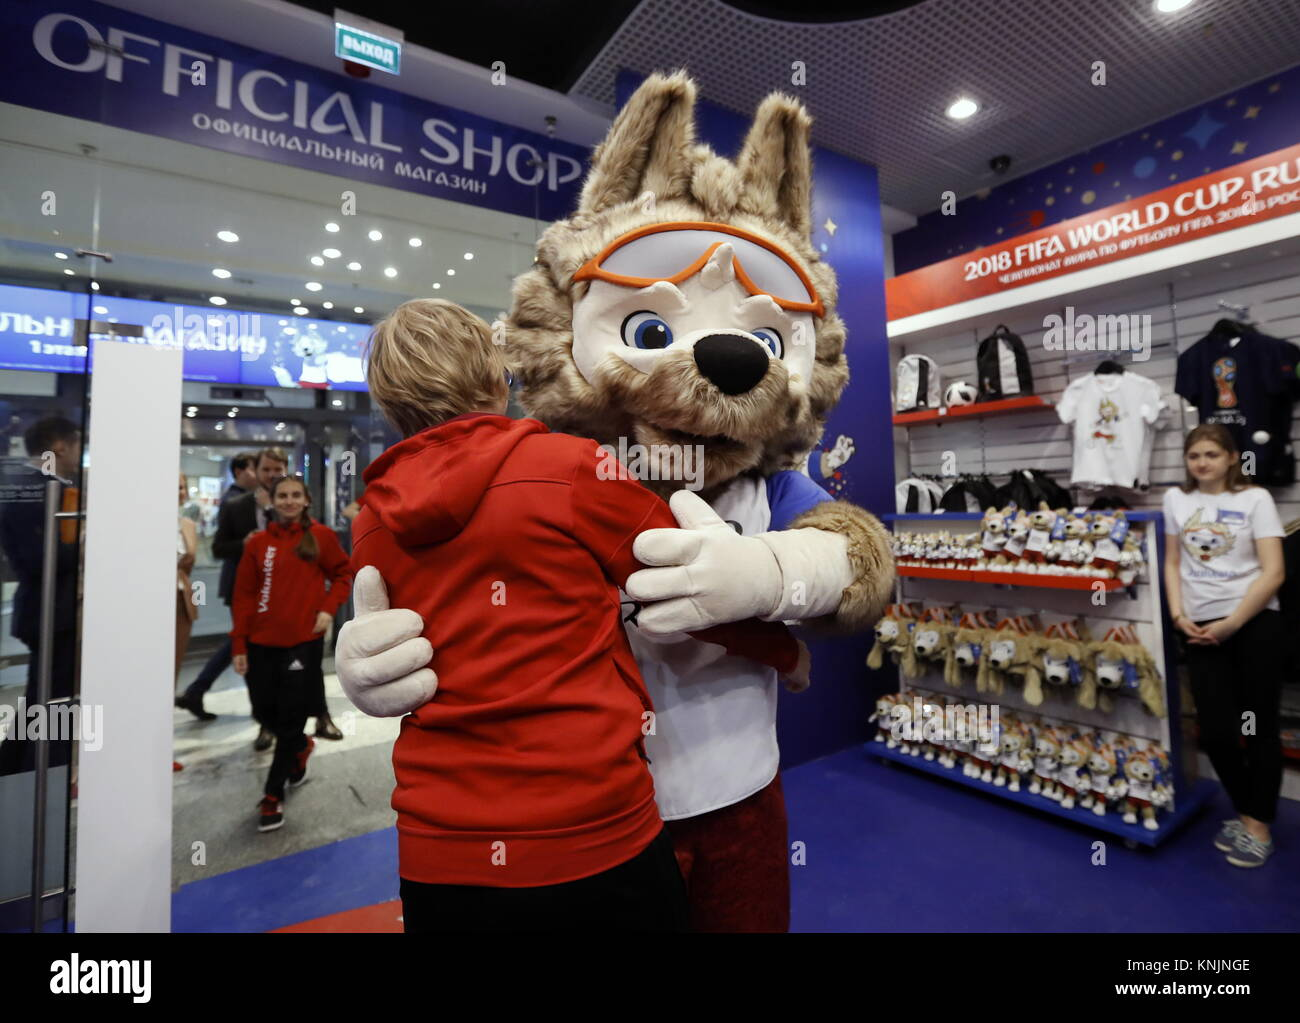 Zabivaka the wolf 2018 World Cup mascot iphone case